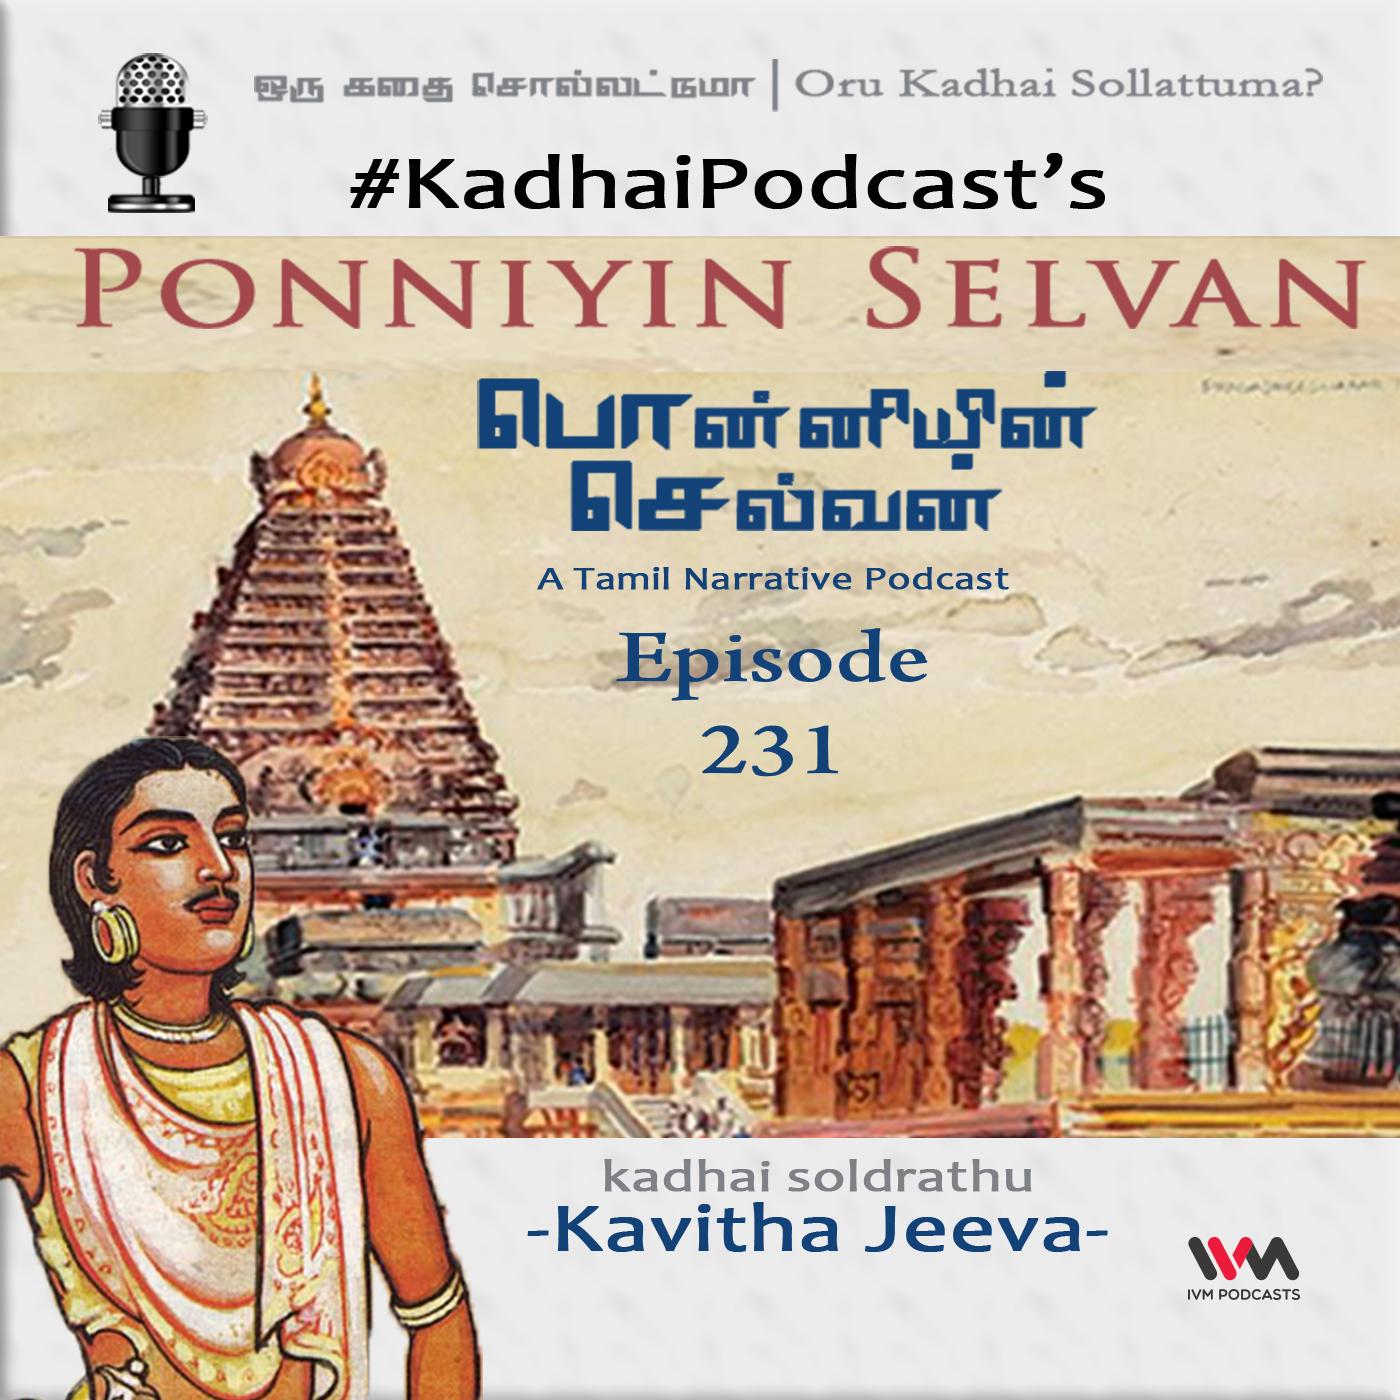 KadhaiPodcast's Ponniyin Selvan - Episode # 231